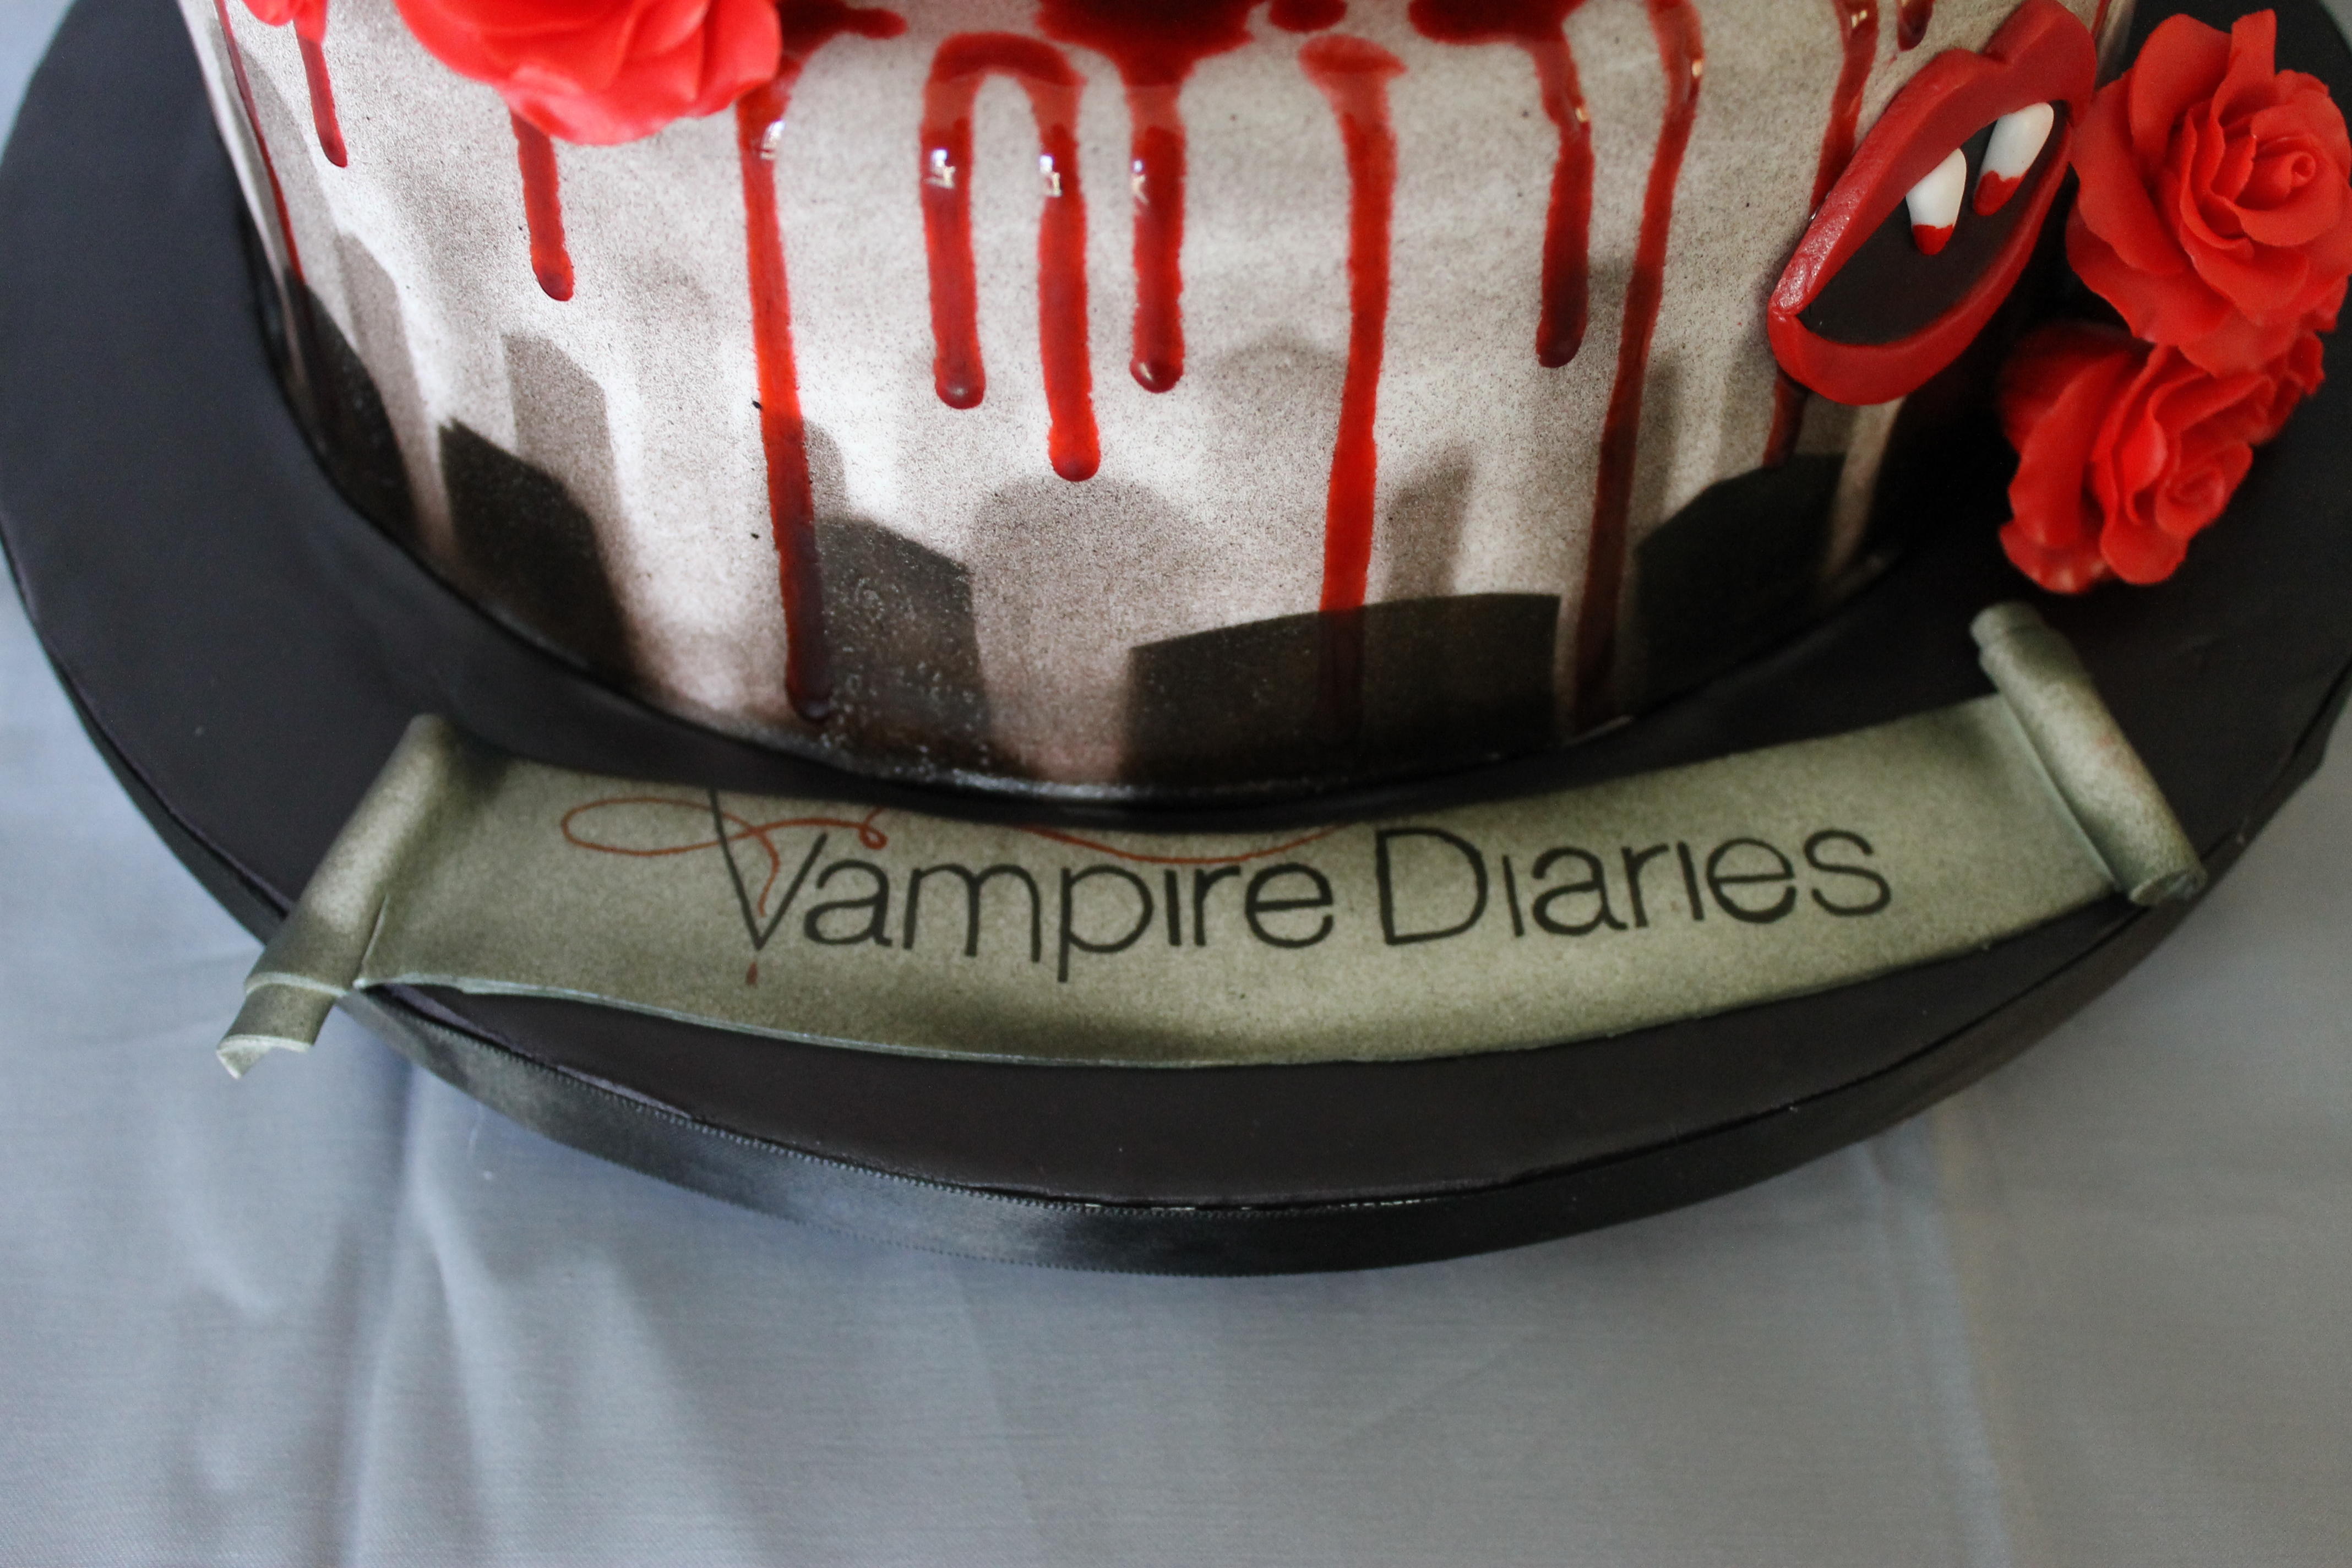 Vampire Diaries Birthday Cake Cakecentral Com